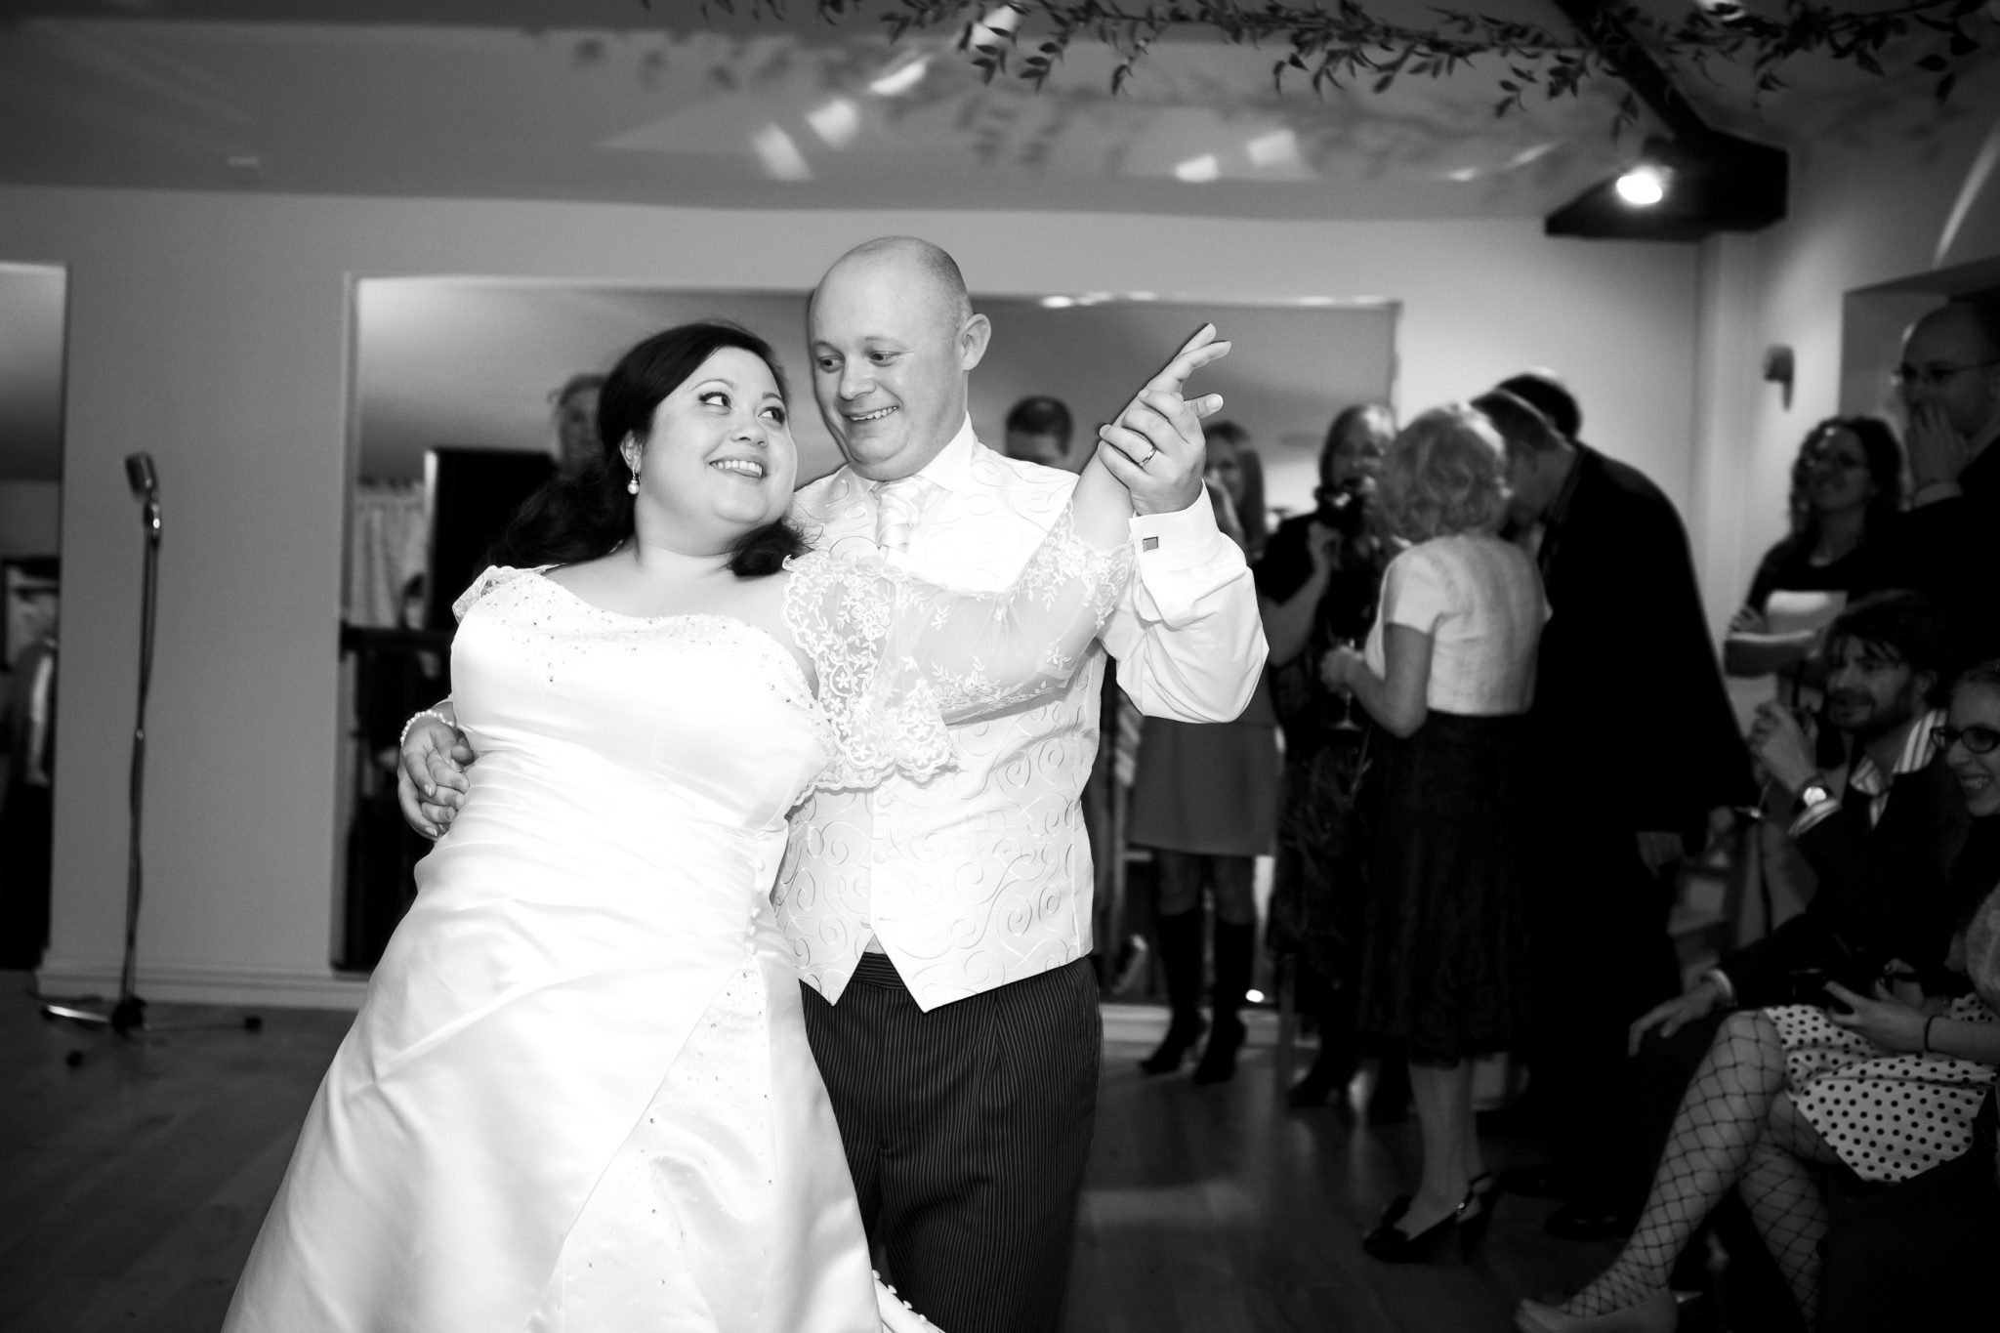 First dance photography at wedding at Oaks Farm, Croydon.